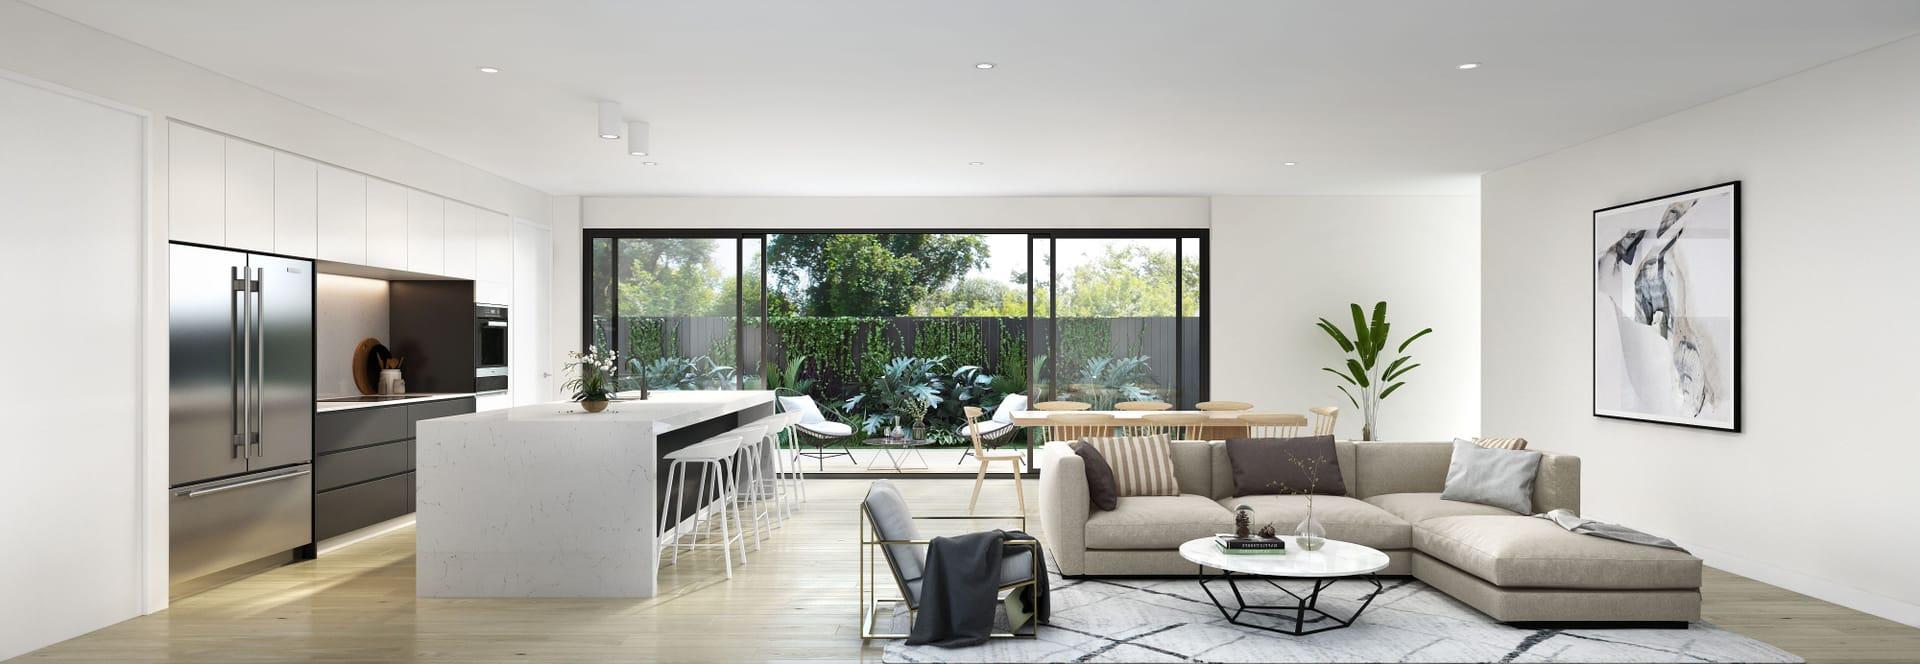 Property 11 Leura Crescent, ROSEBUD VIC 3939 secondary IMAGE